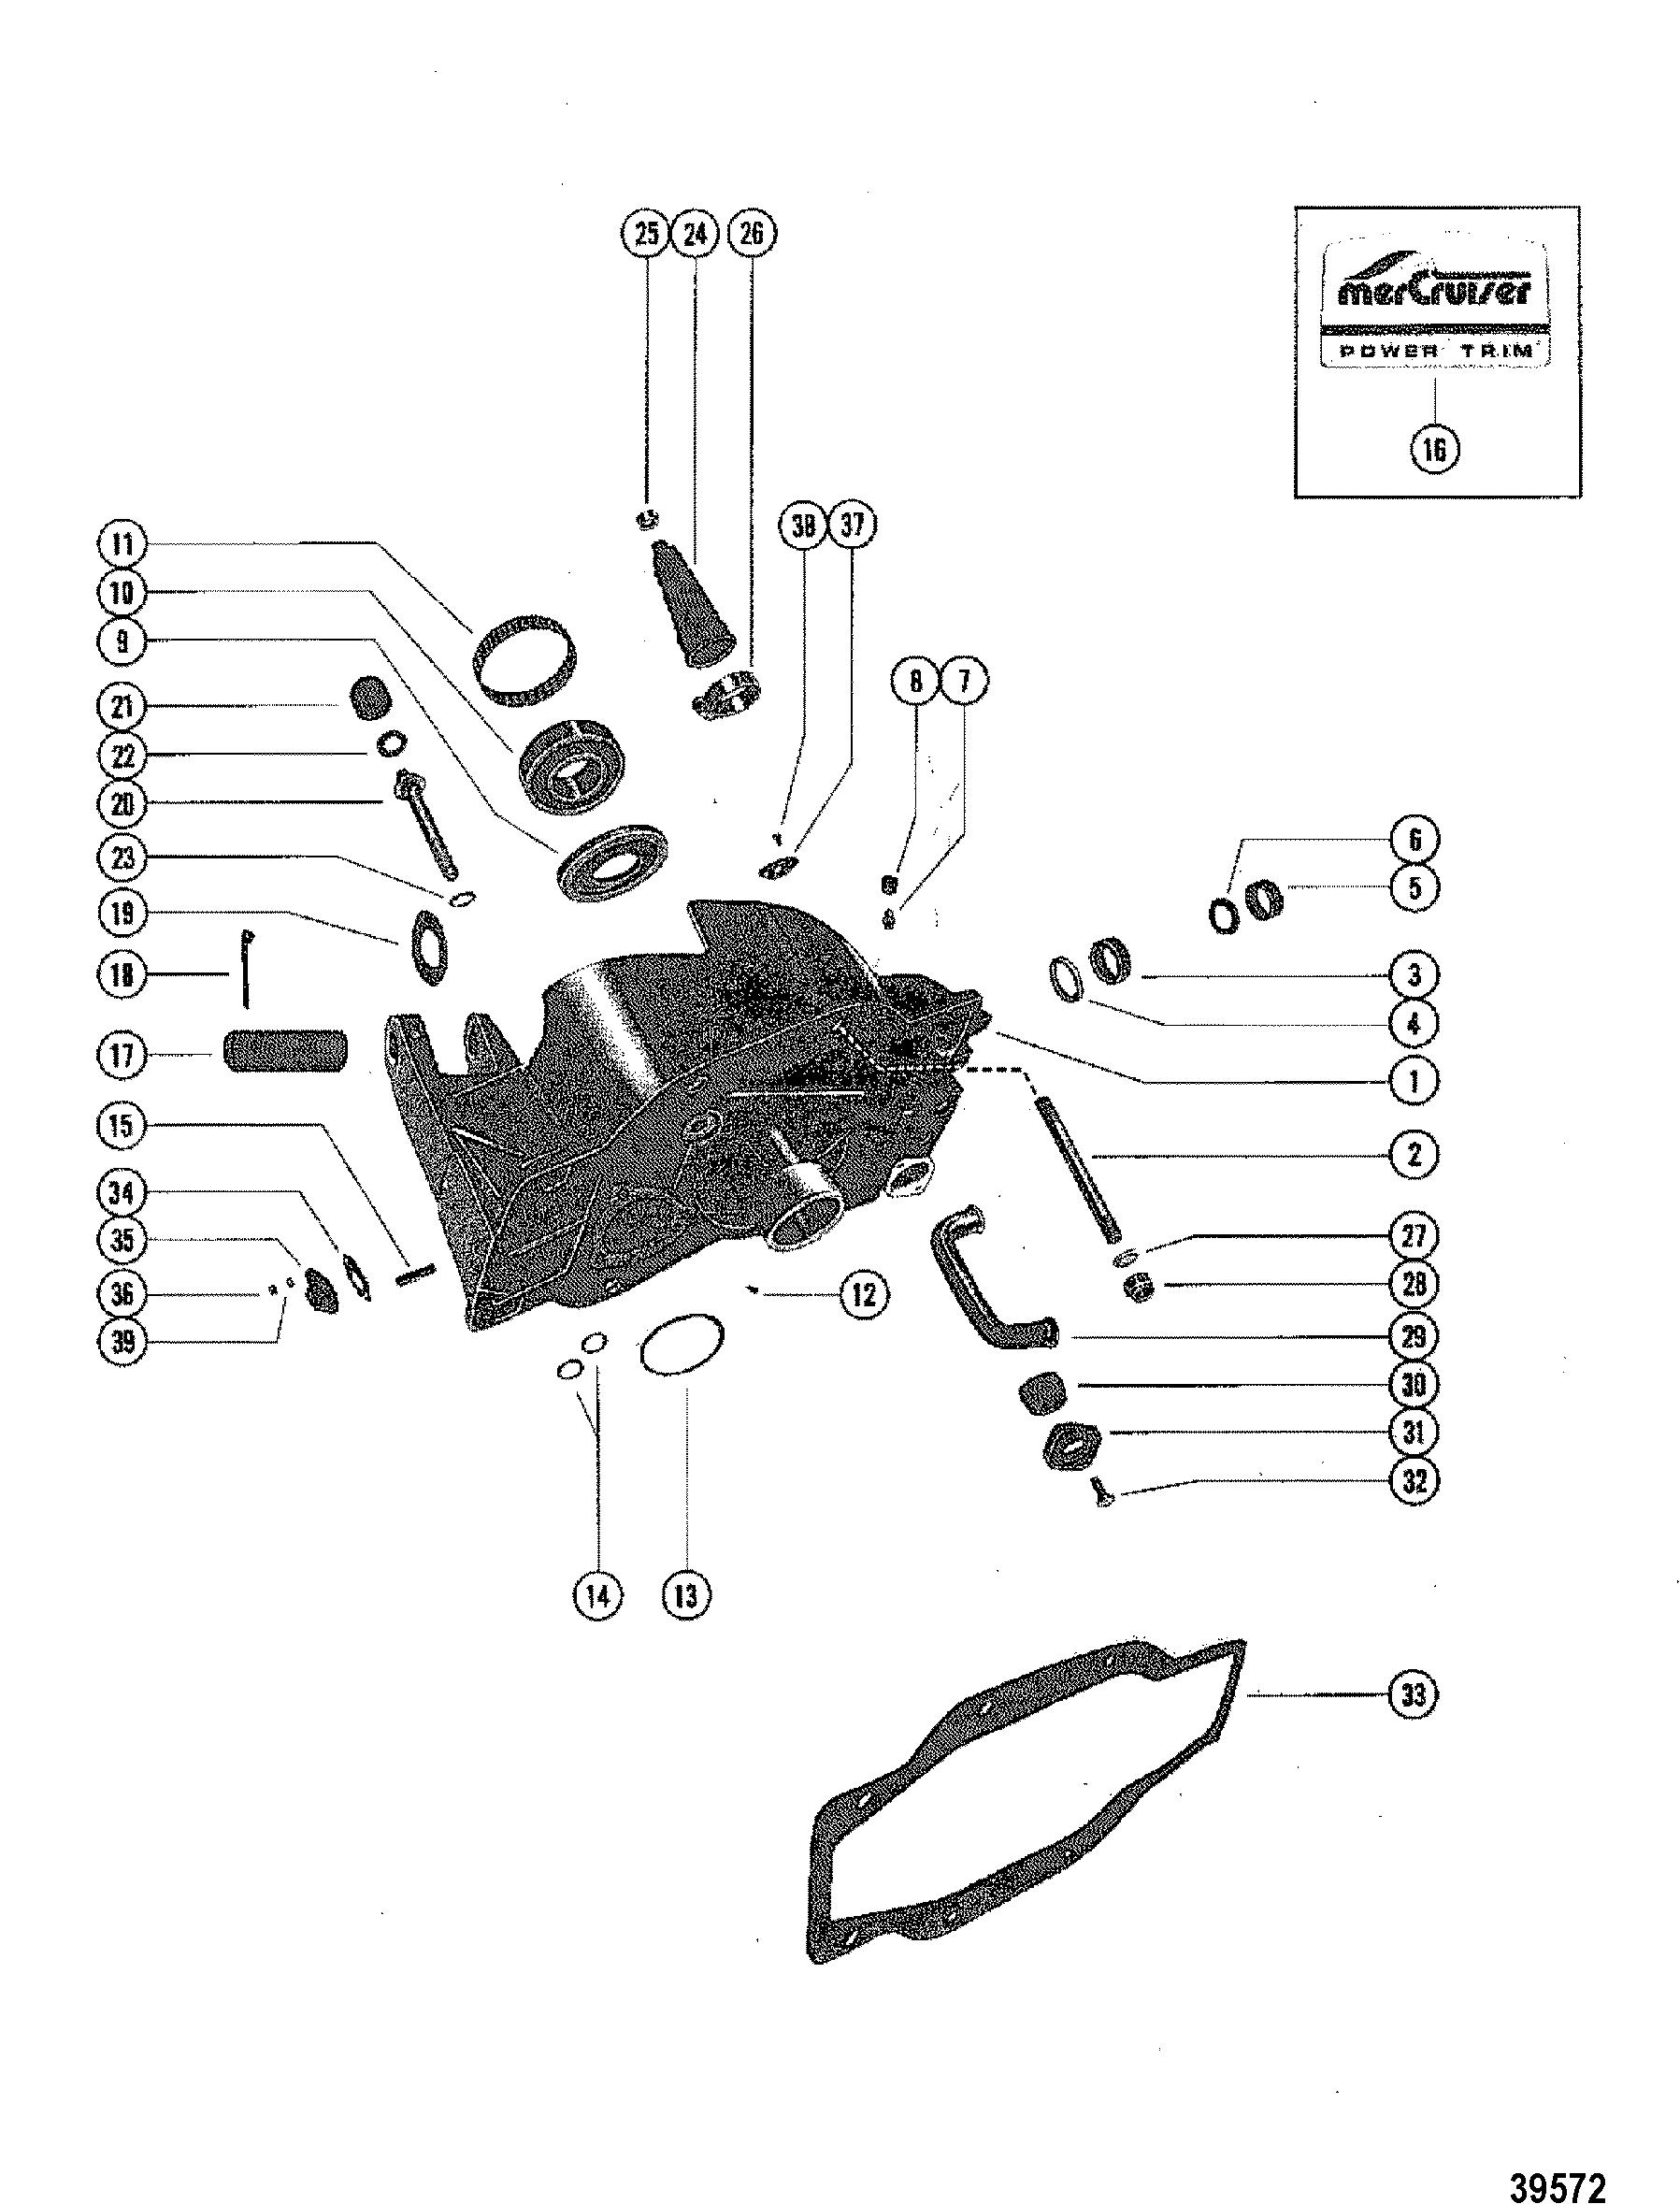 mercruiser 165 outdrive diagram mercruiser dual control